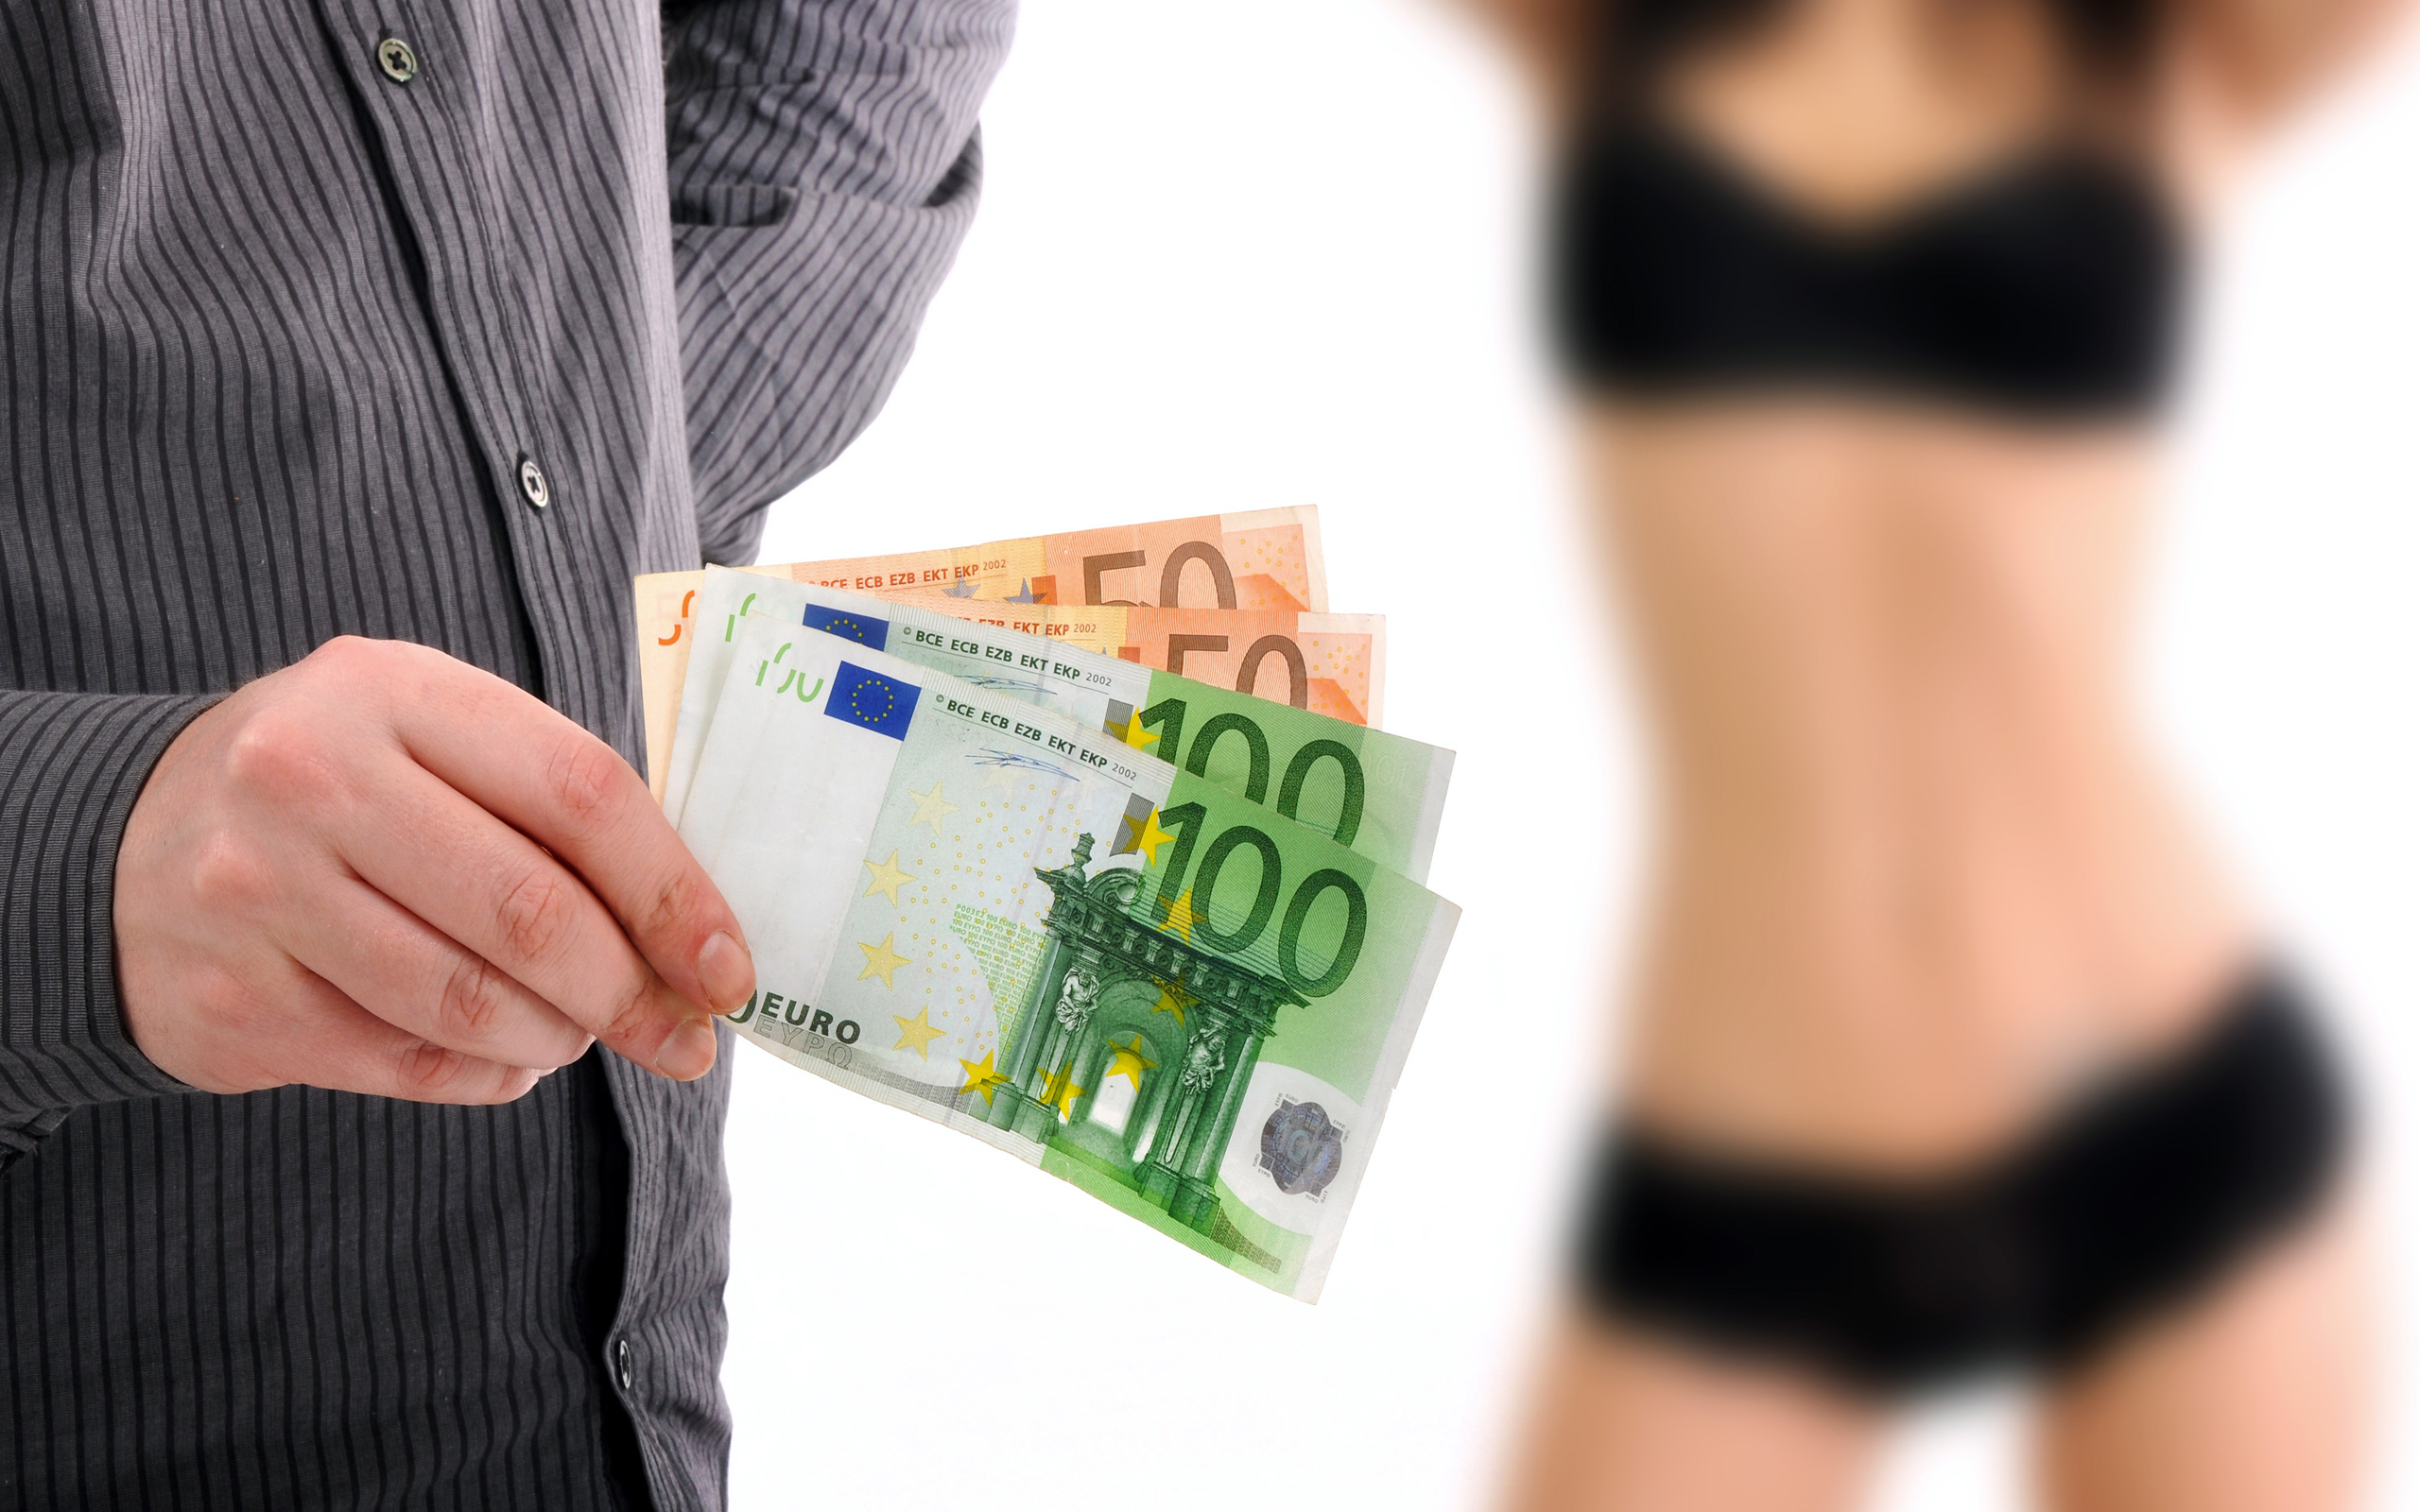 евро, день, мужик